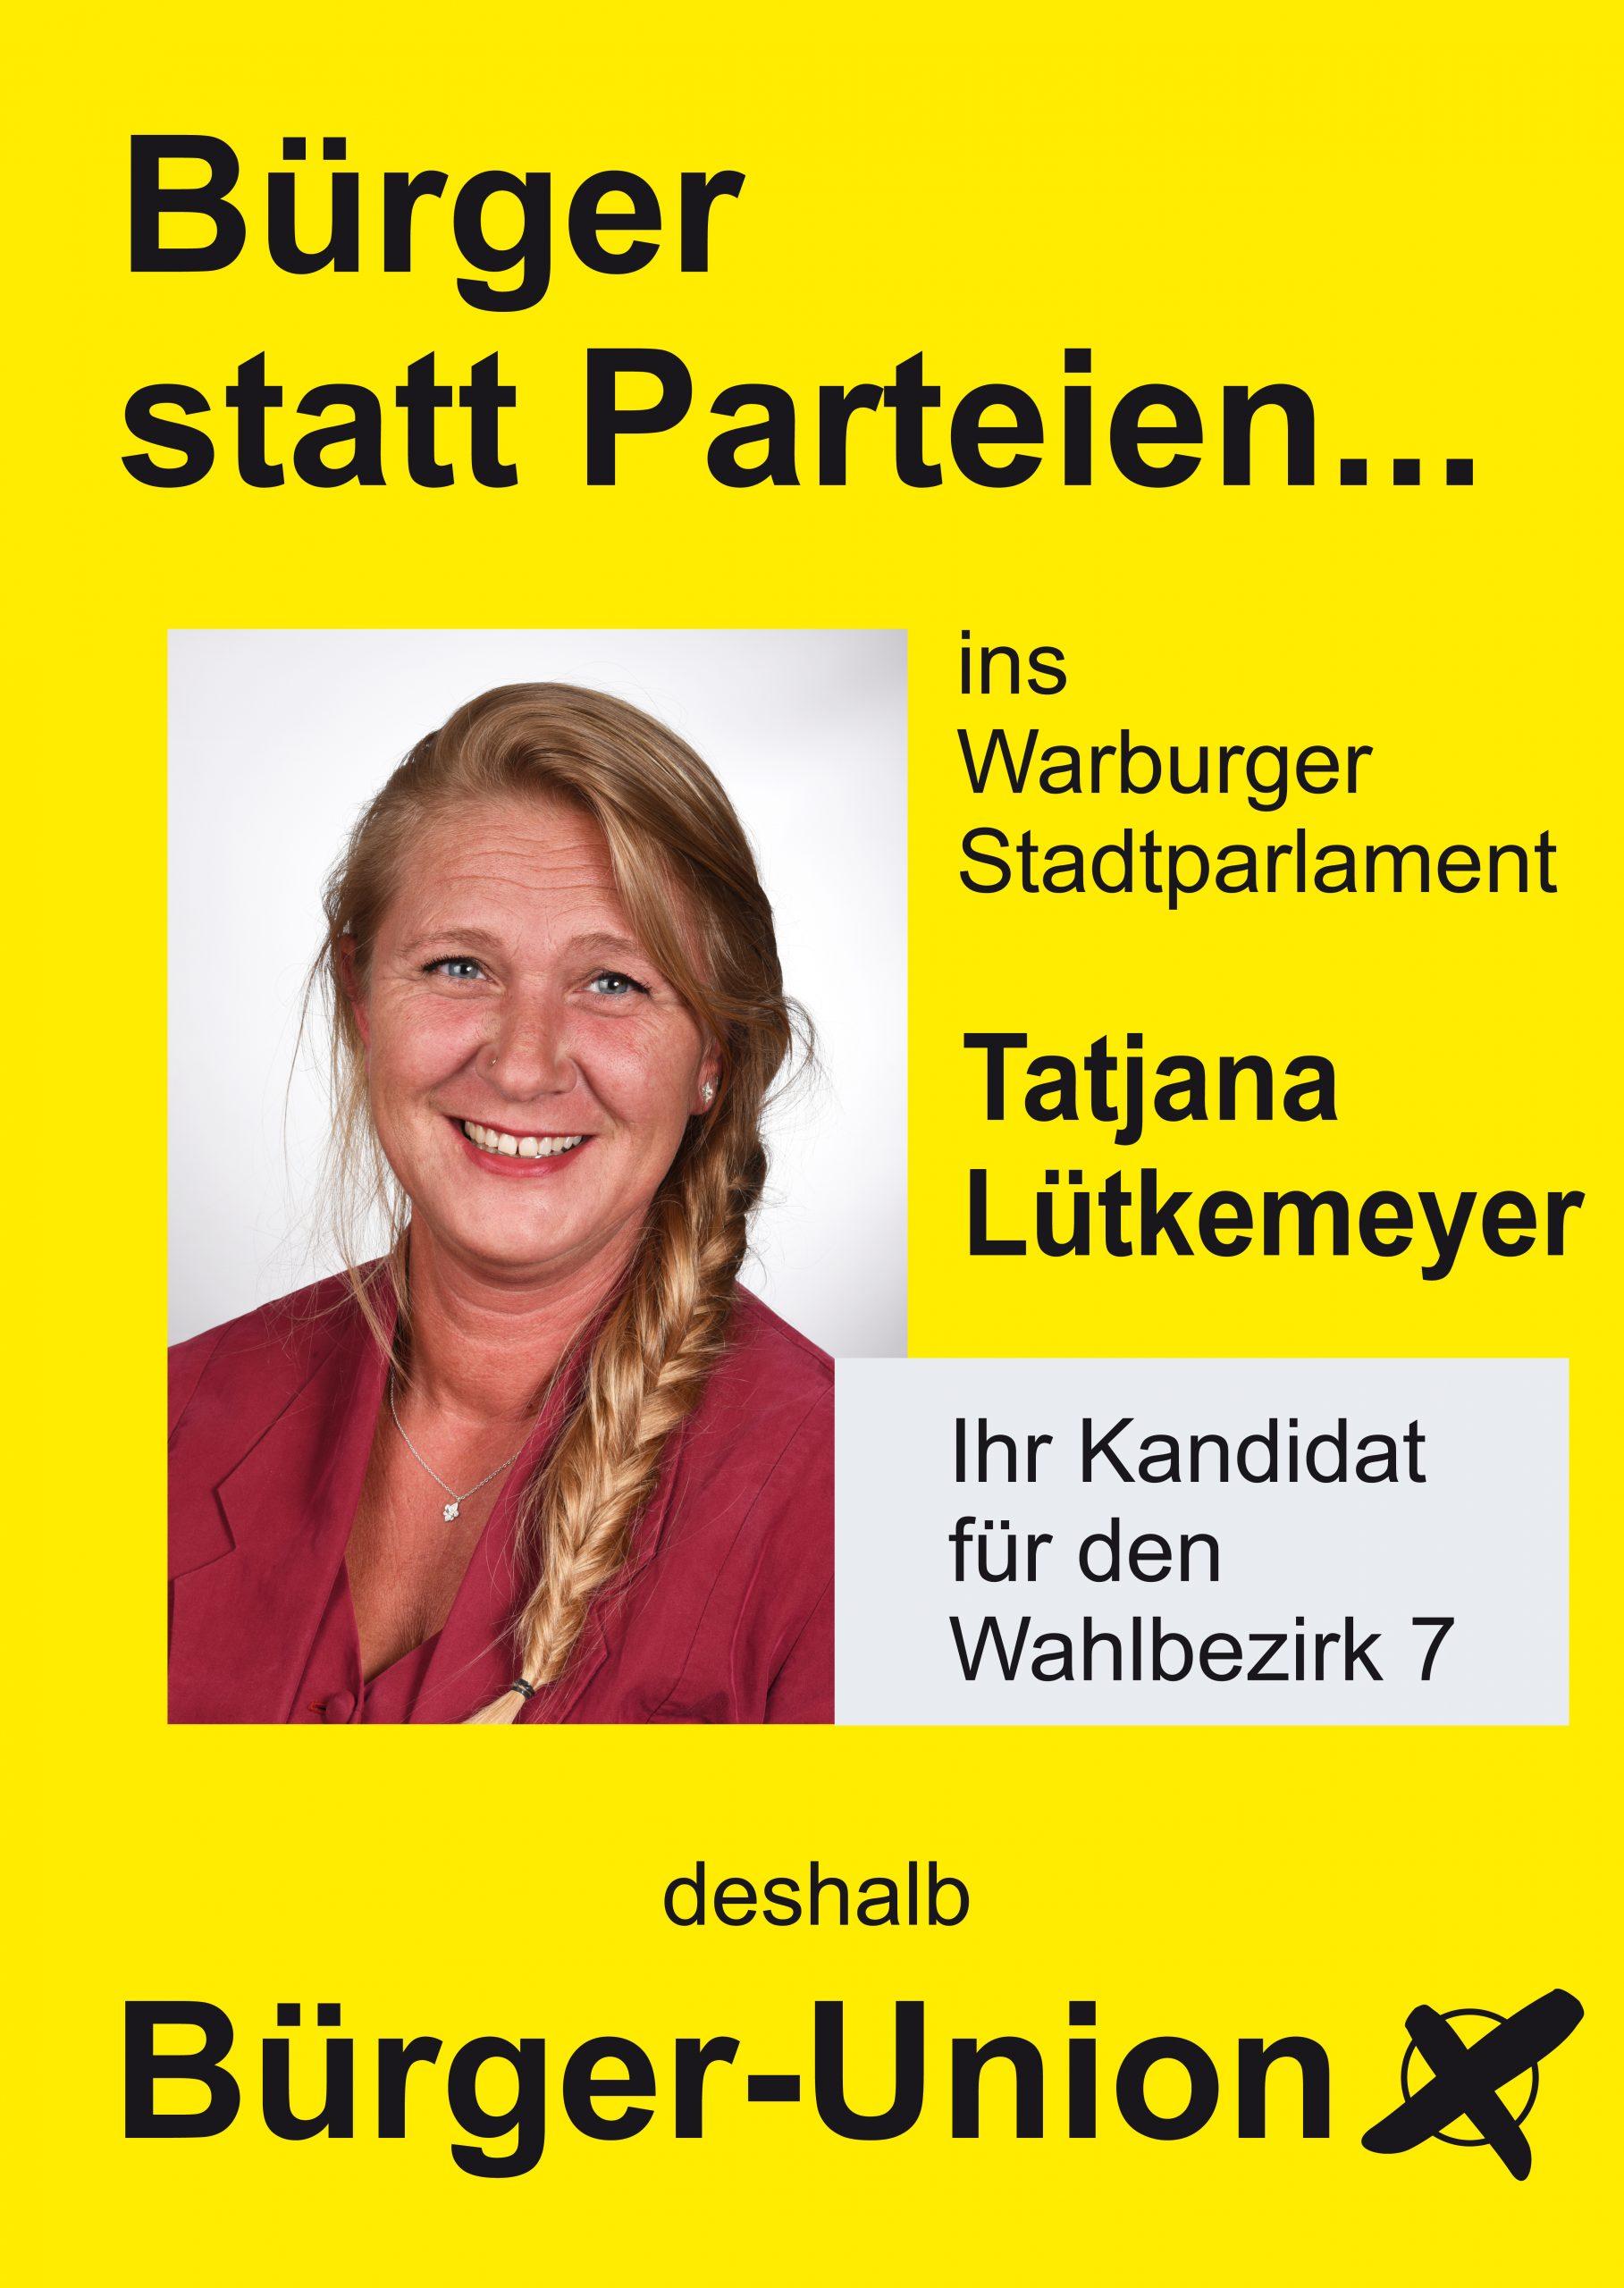 Bürgermeisterkandidat u .Wahlbezirk 7: Tatjana Lütkemeyer